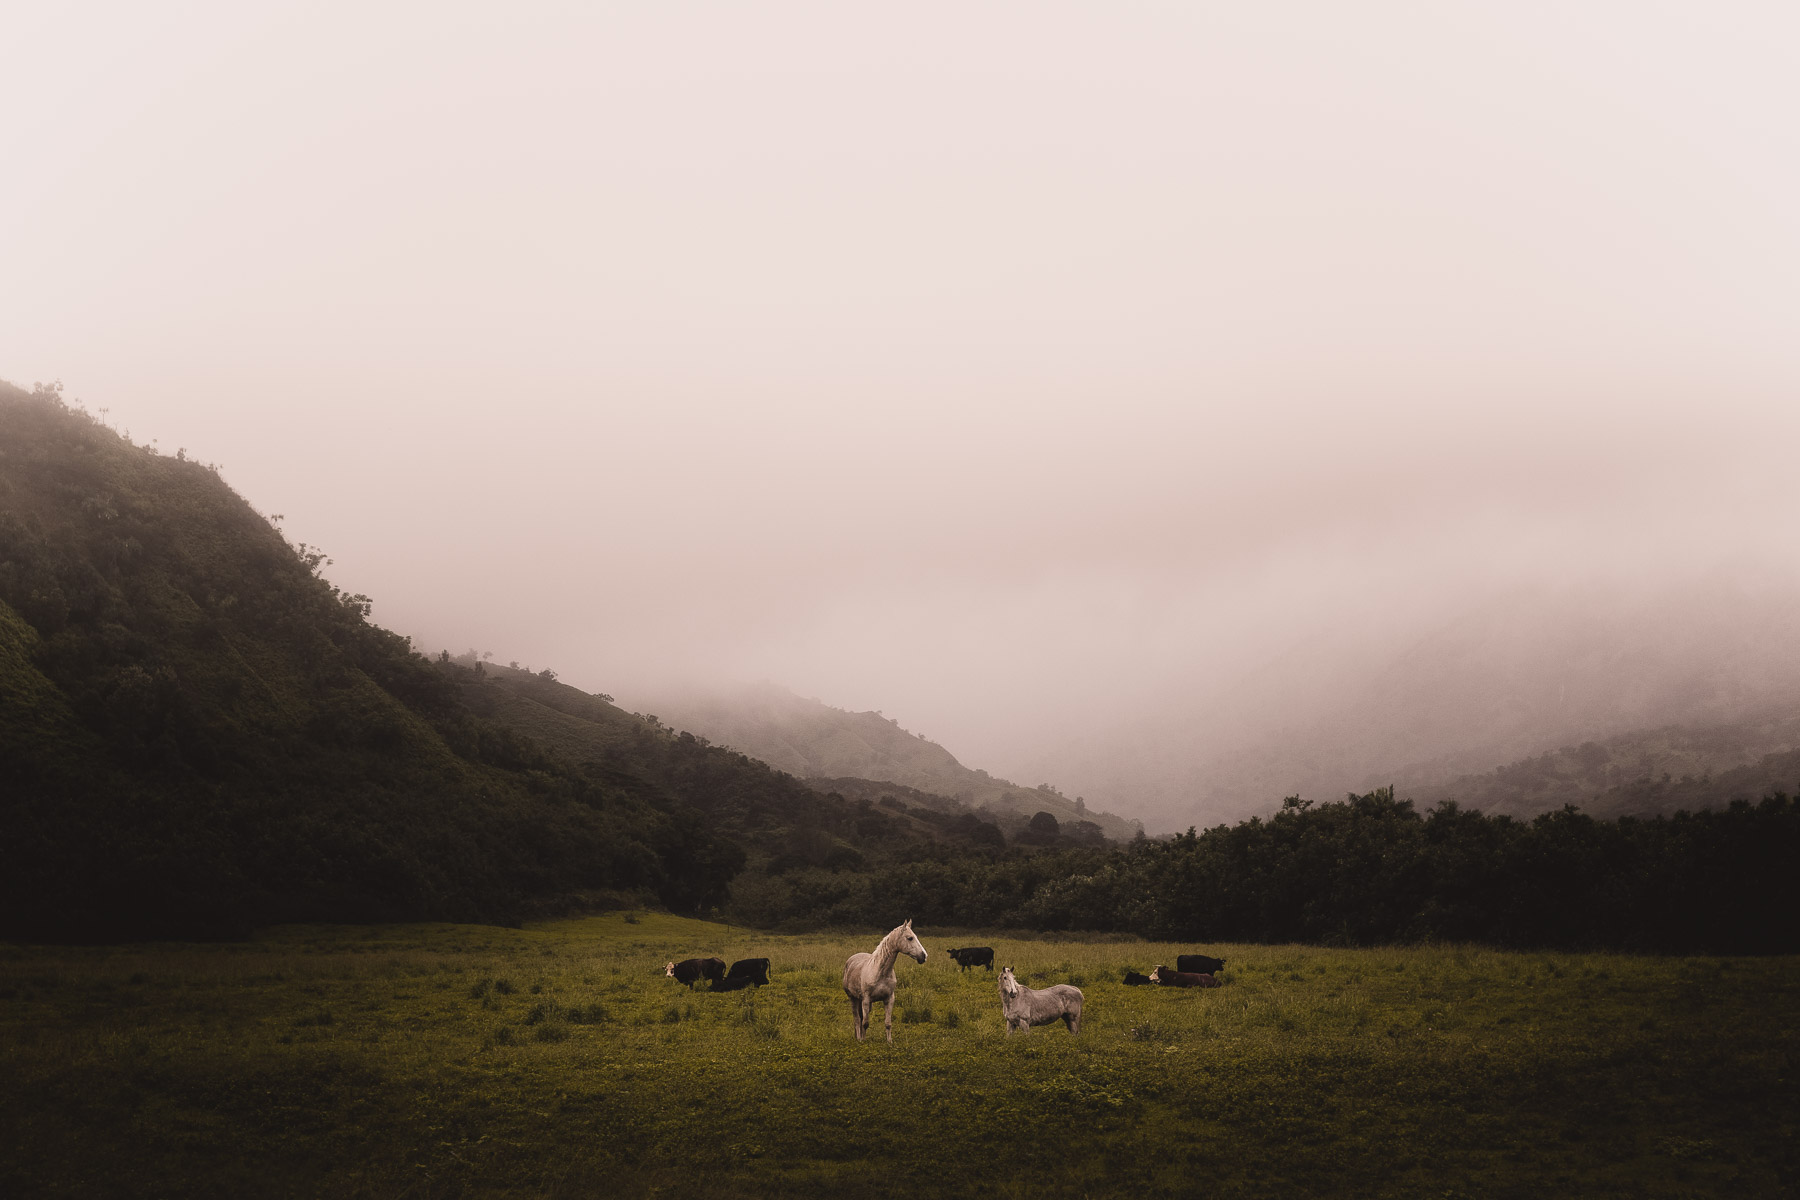 landscape-photography-kauai-wild-horses.jpg